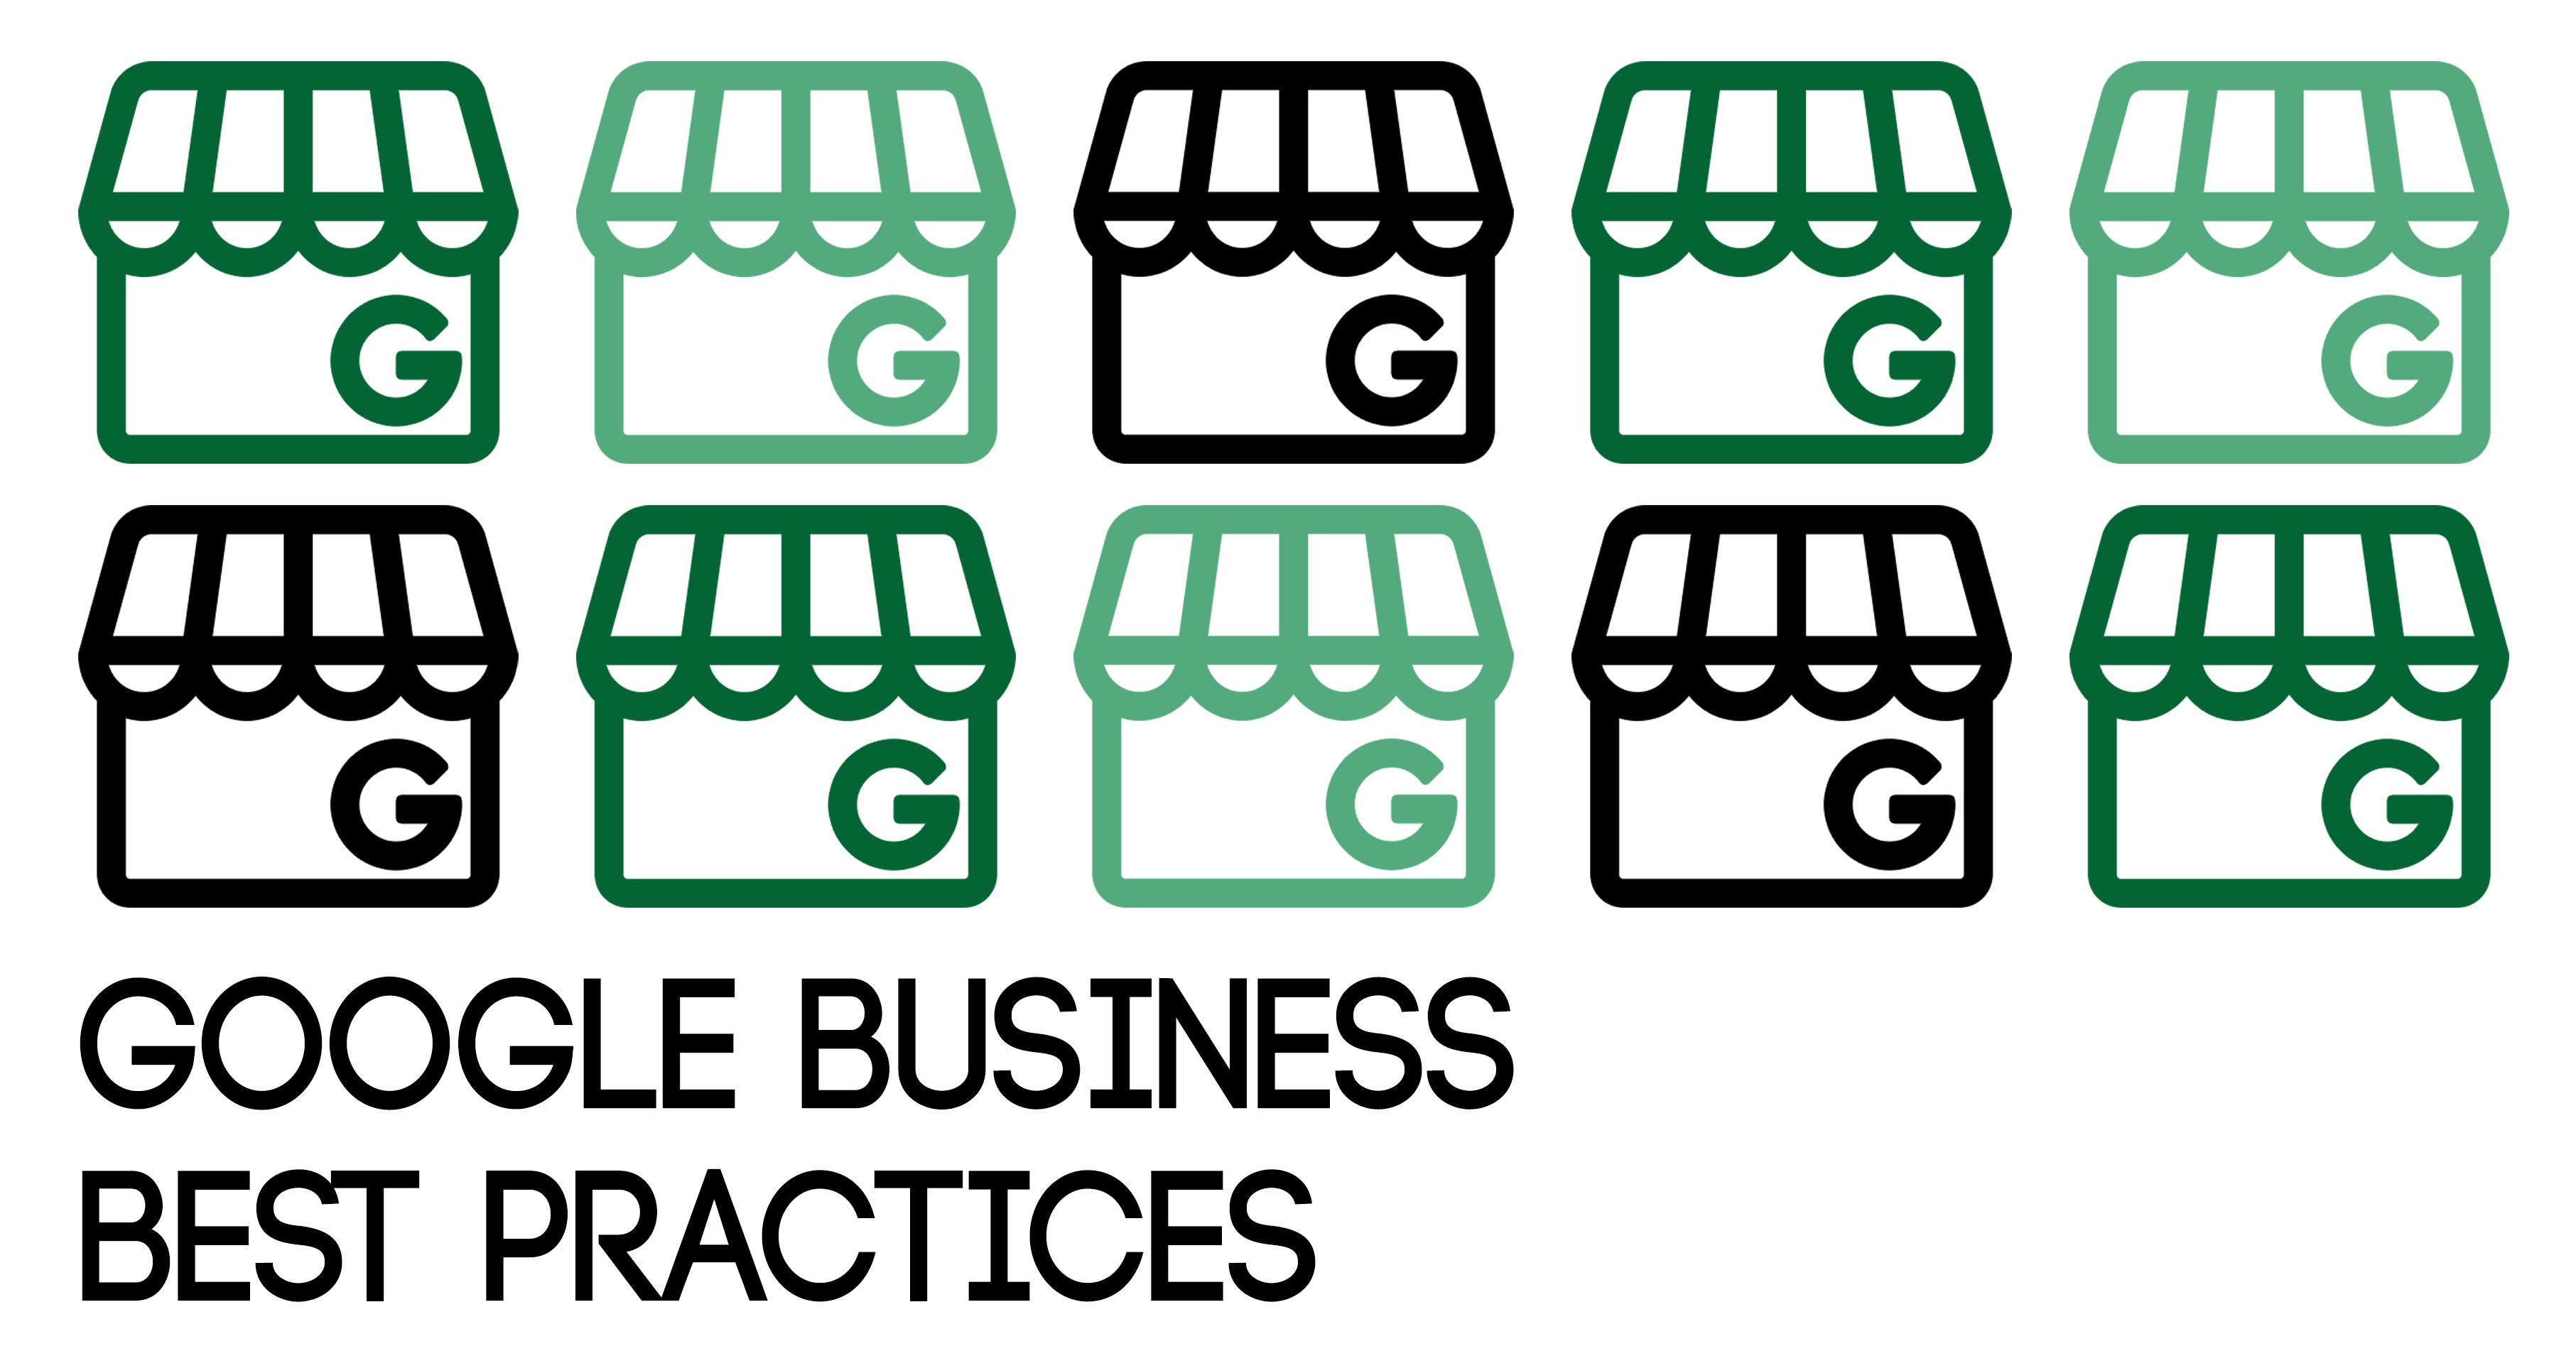 Google Business Best Practices